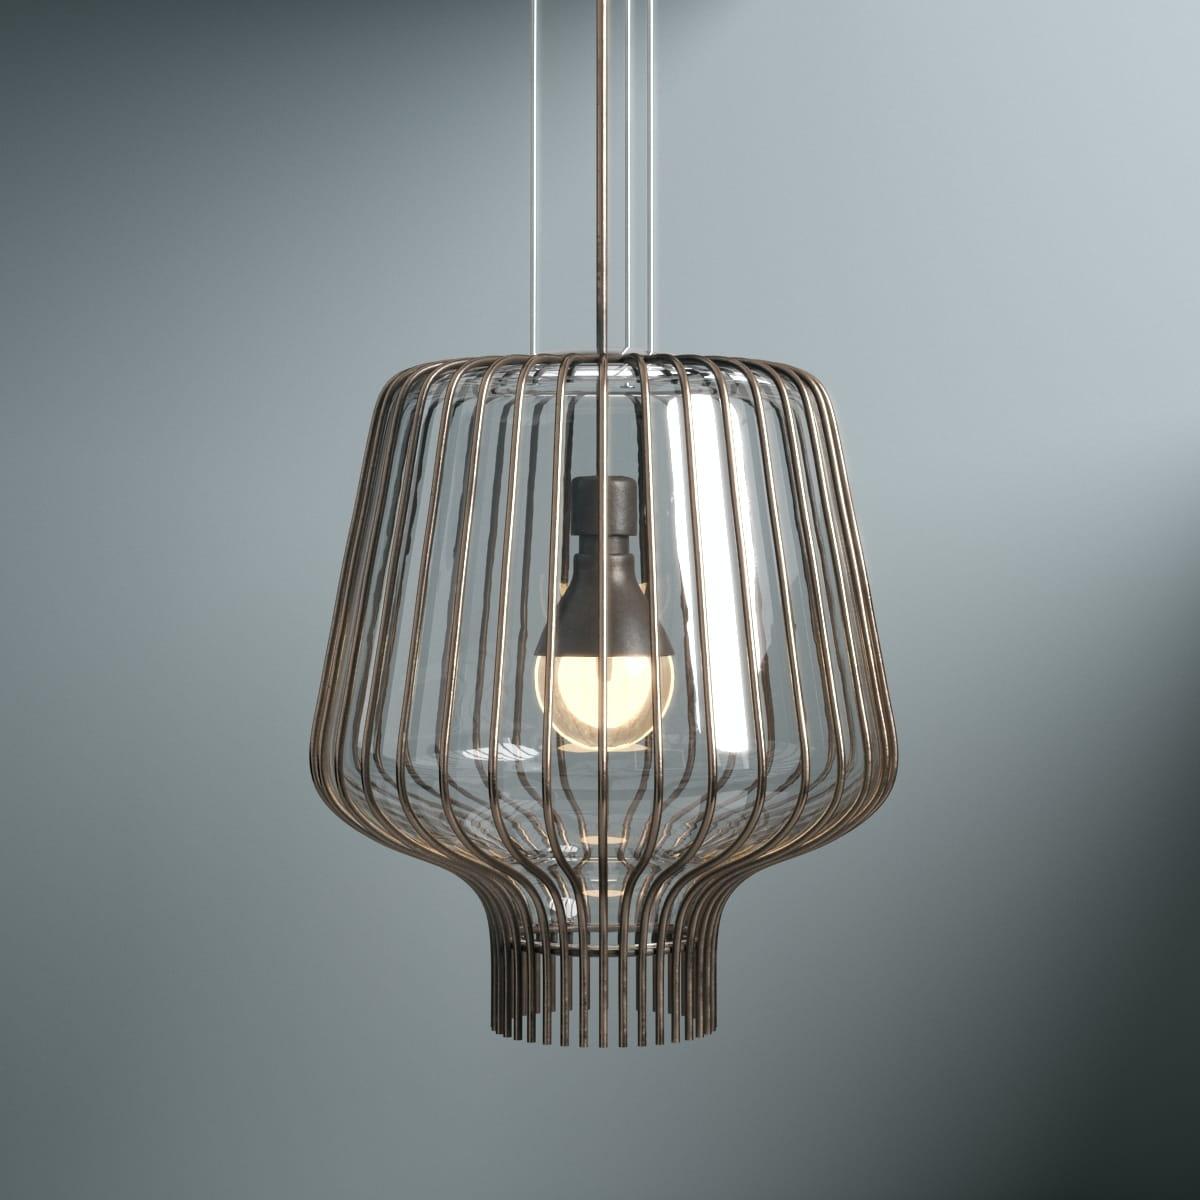 lamp 55 AM247